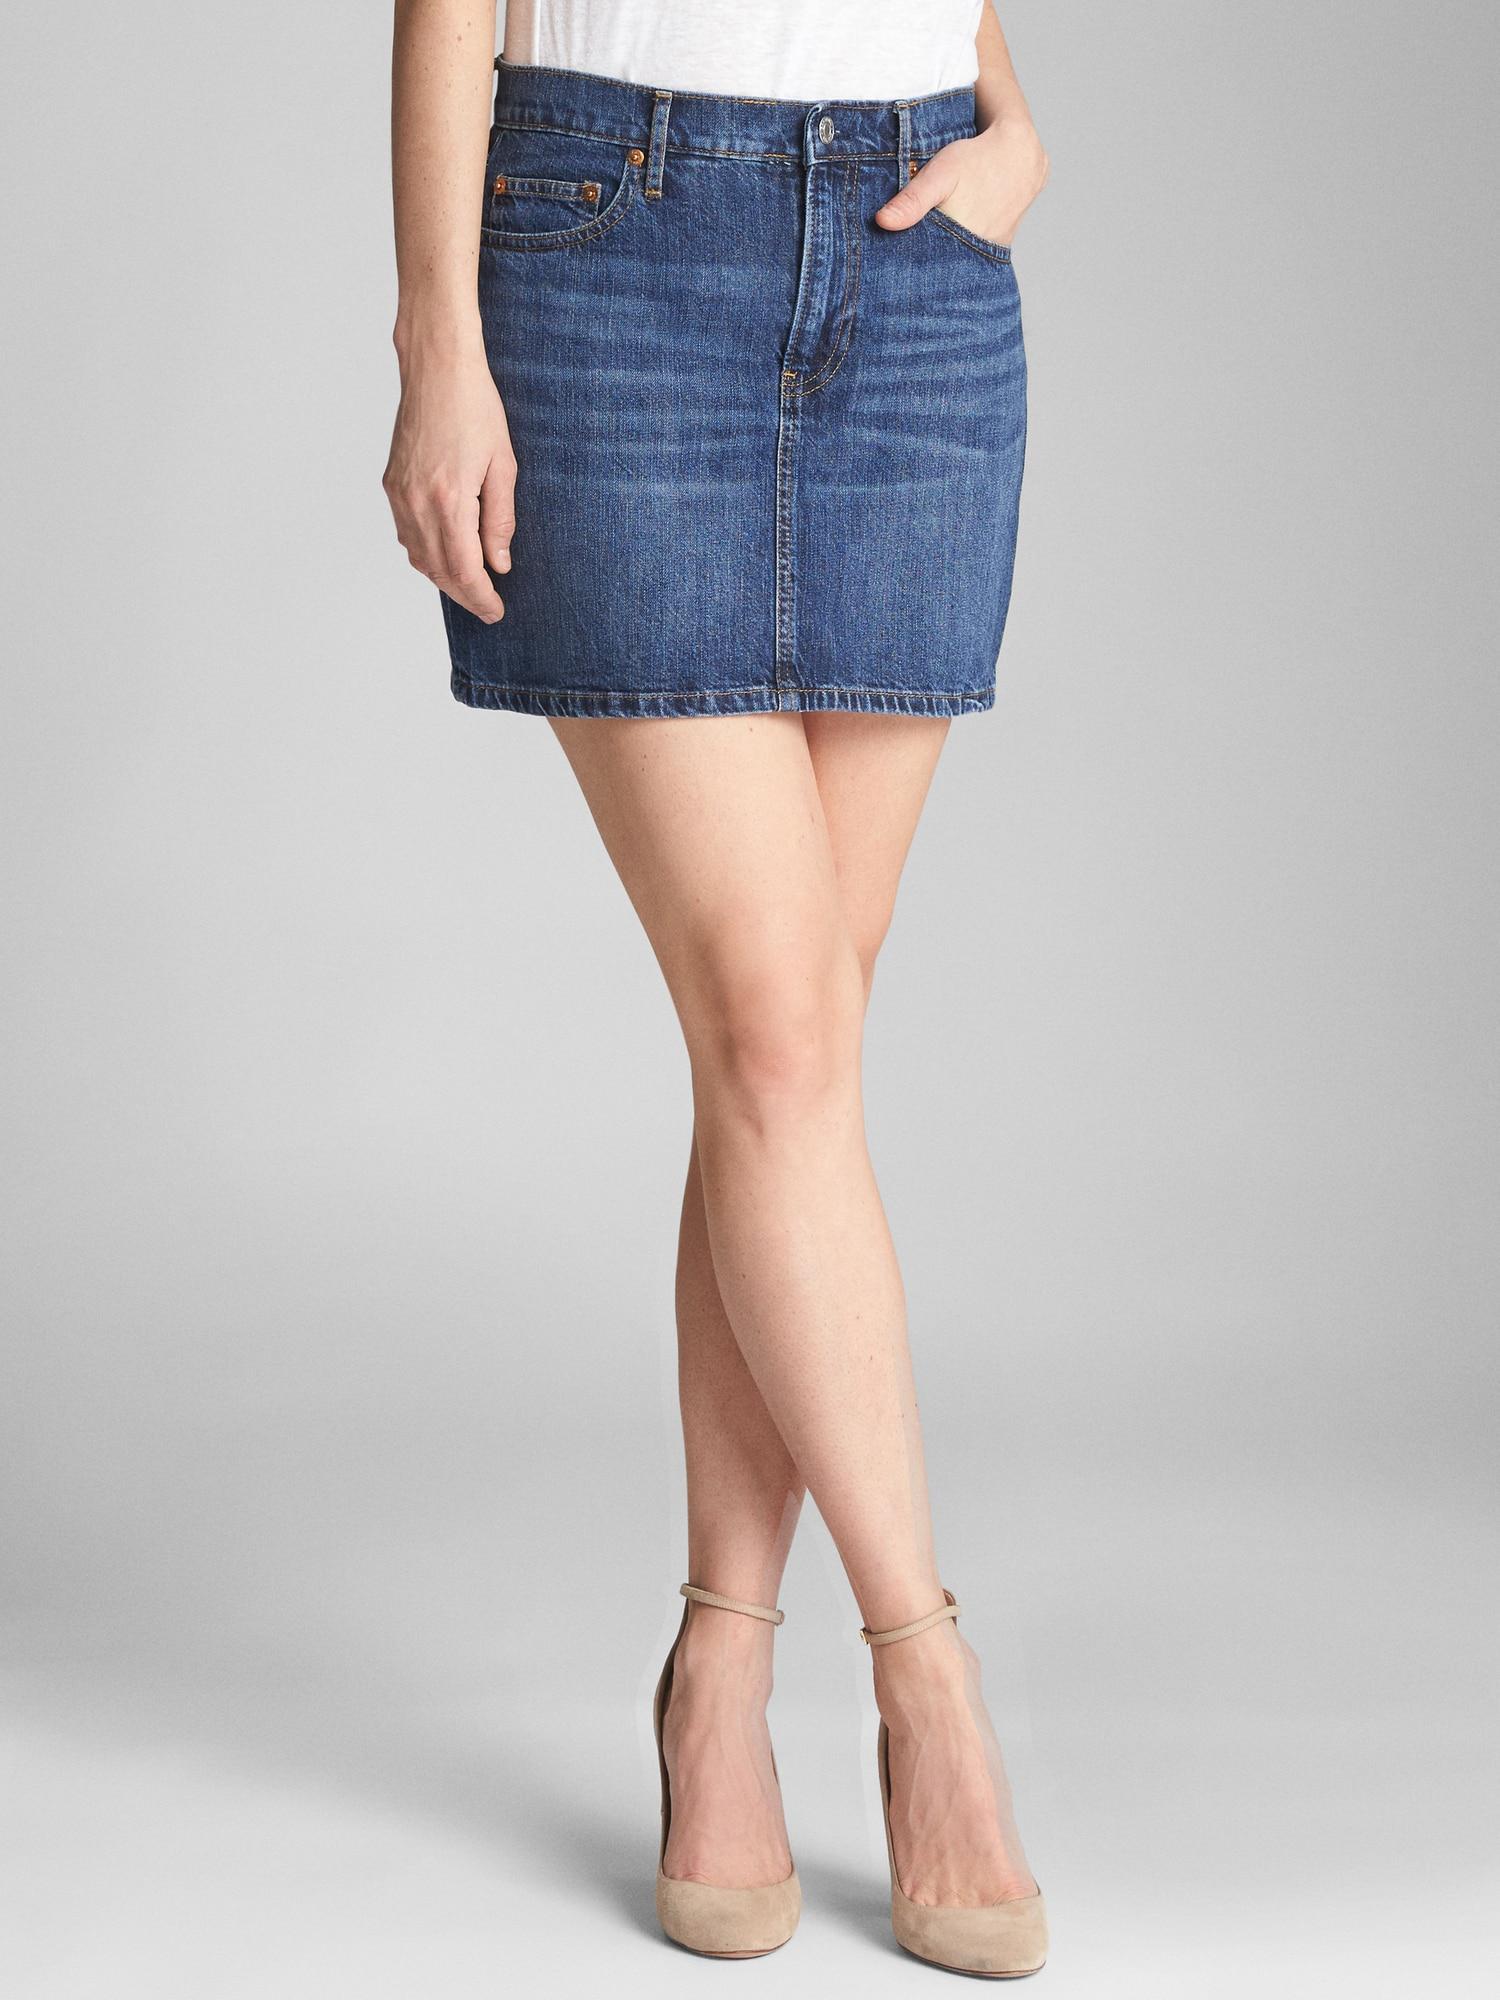 874fd0ce68 GAP Factory 5-pocket Denim Mini Skirt in Blue - Lyst